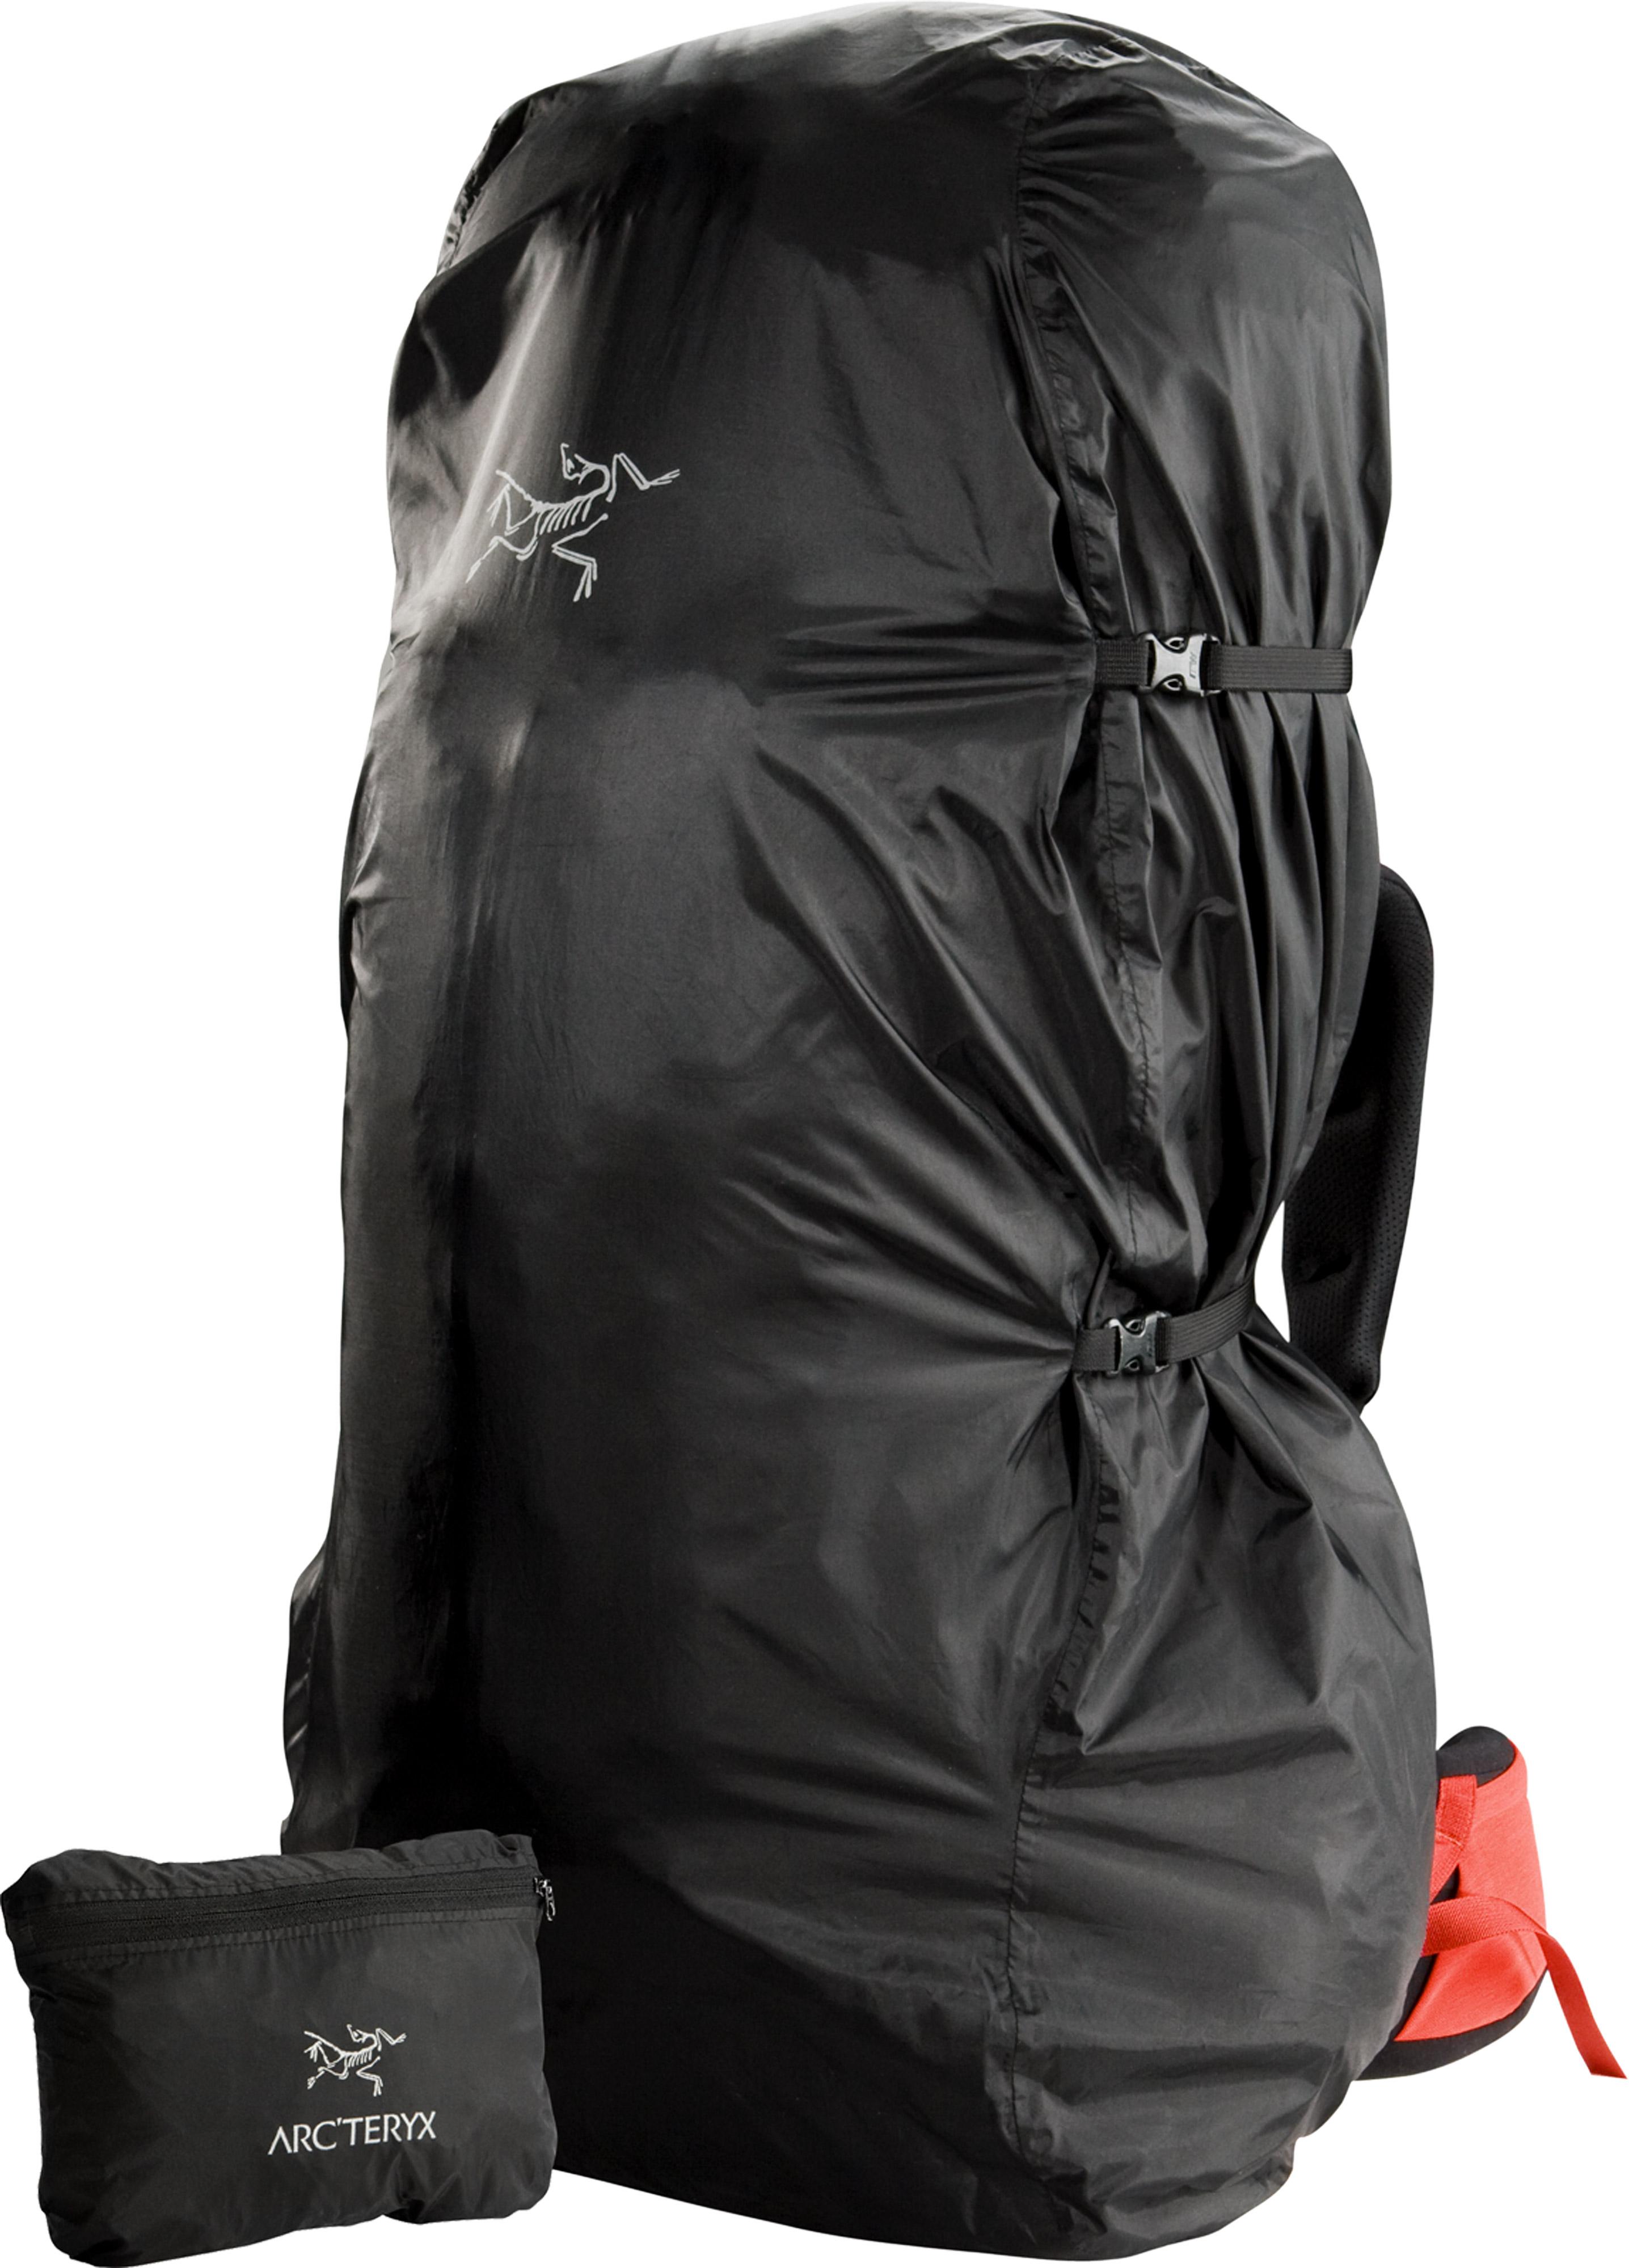 Imagem de Arc'teryx Pack shelter